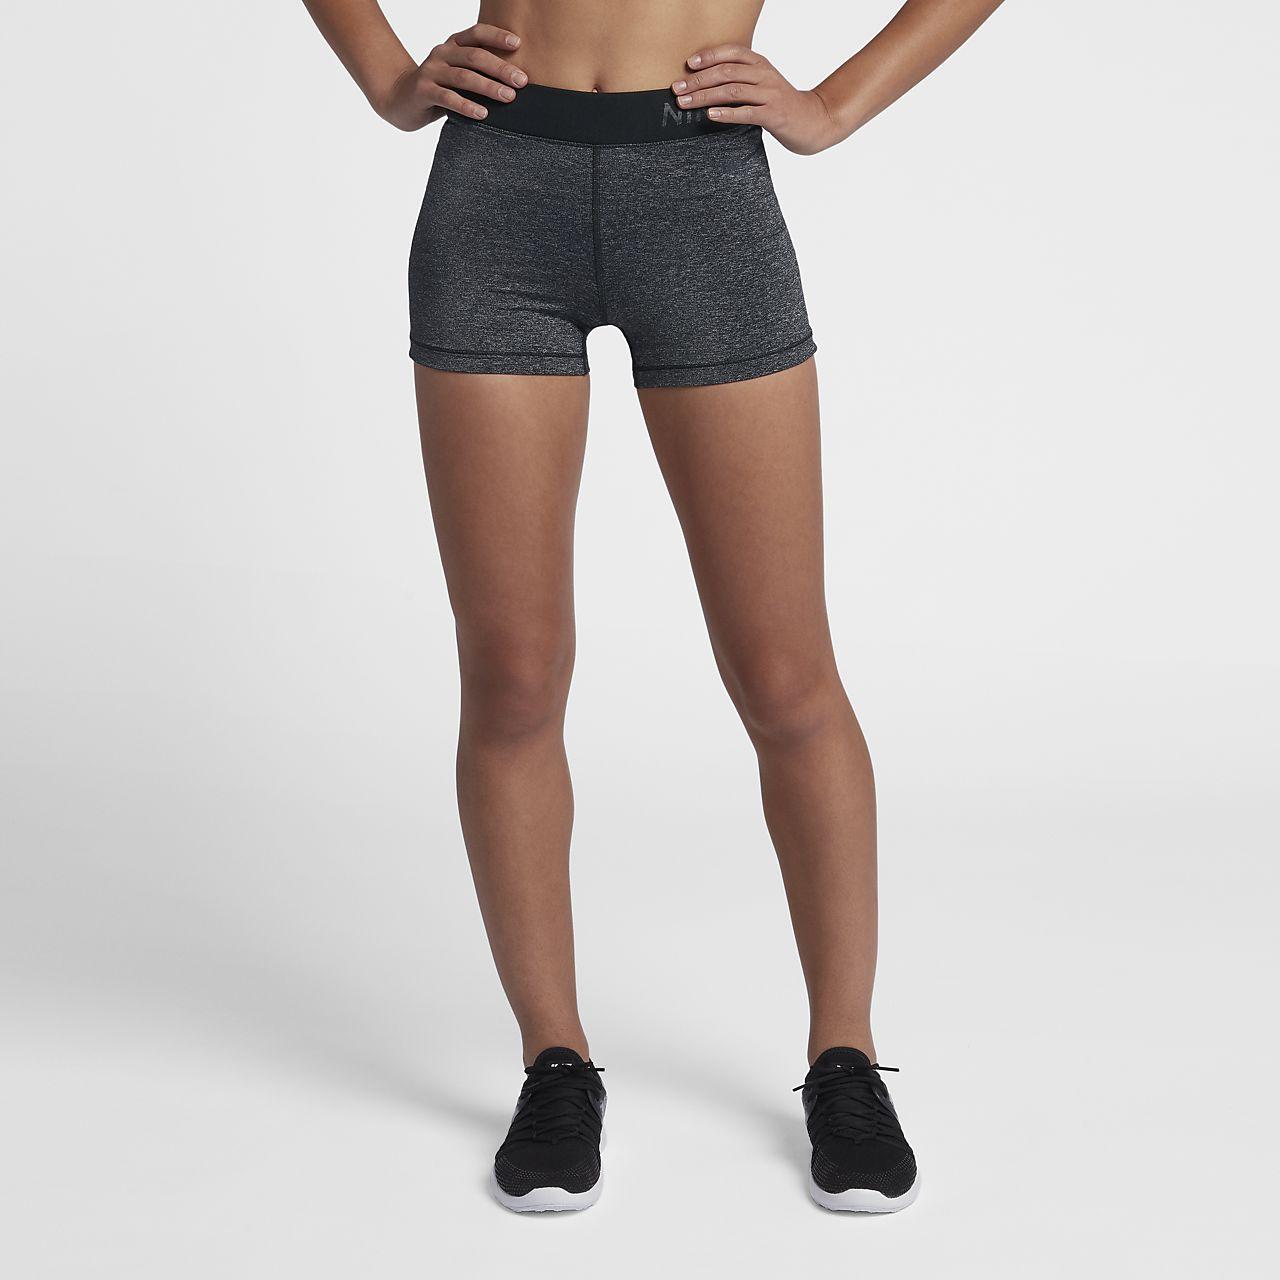 Training Nike Pro HyperCool Women s 3 7 5cm approx Training Shorts